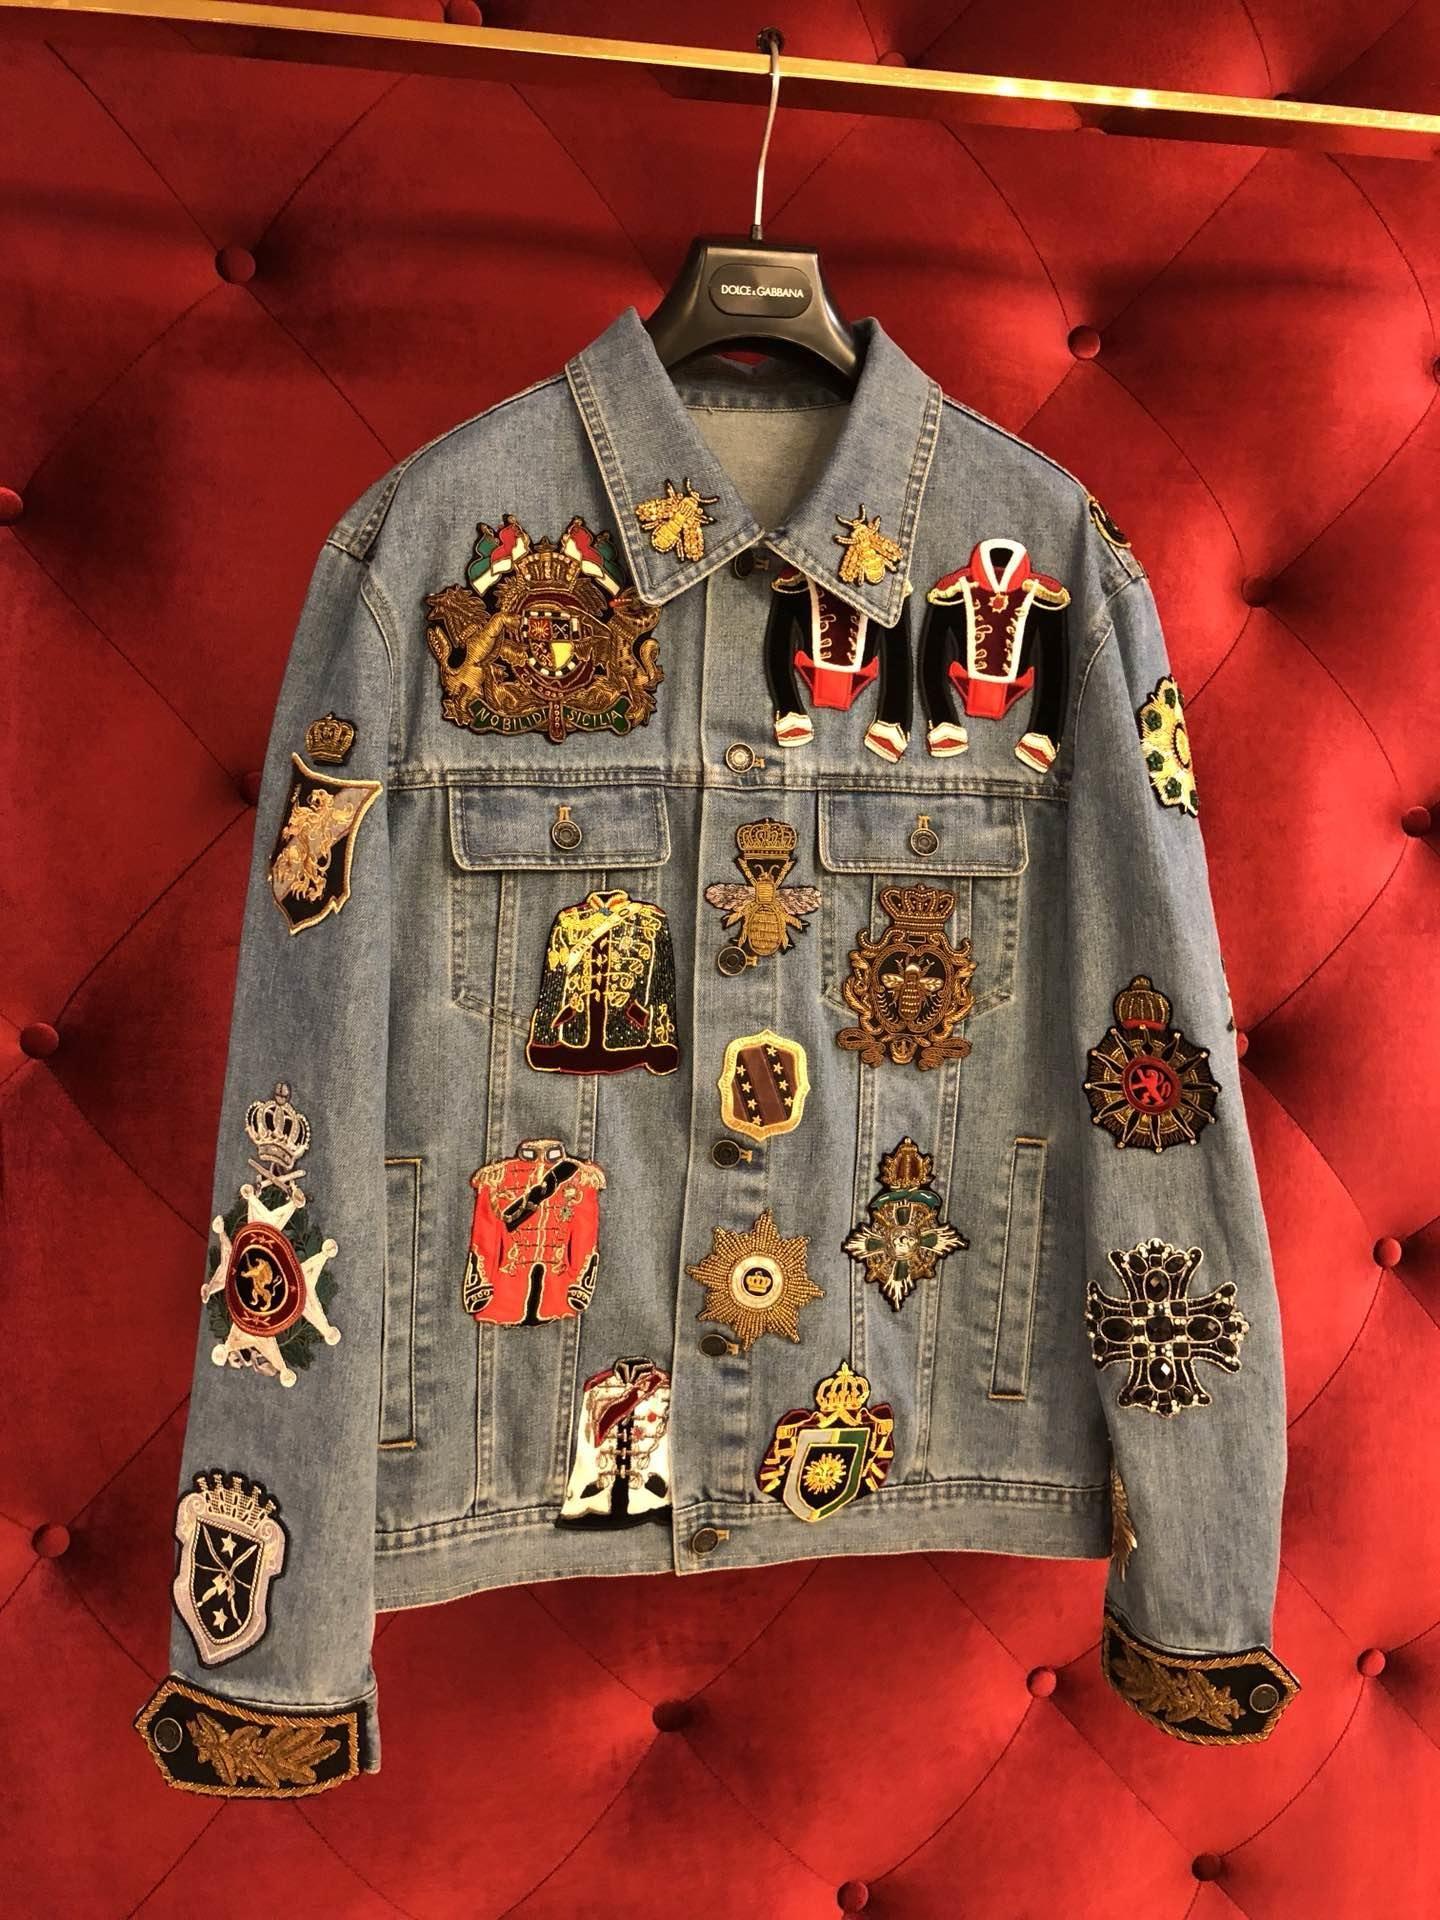 85caf5563ce6d3 Replica Dolce & Gabbana Medal Denim Jacket 2019 #50216 – Buy Good Items:  Best